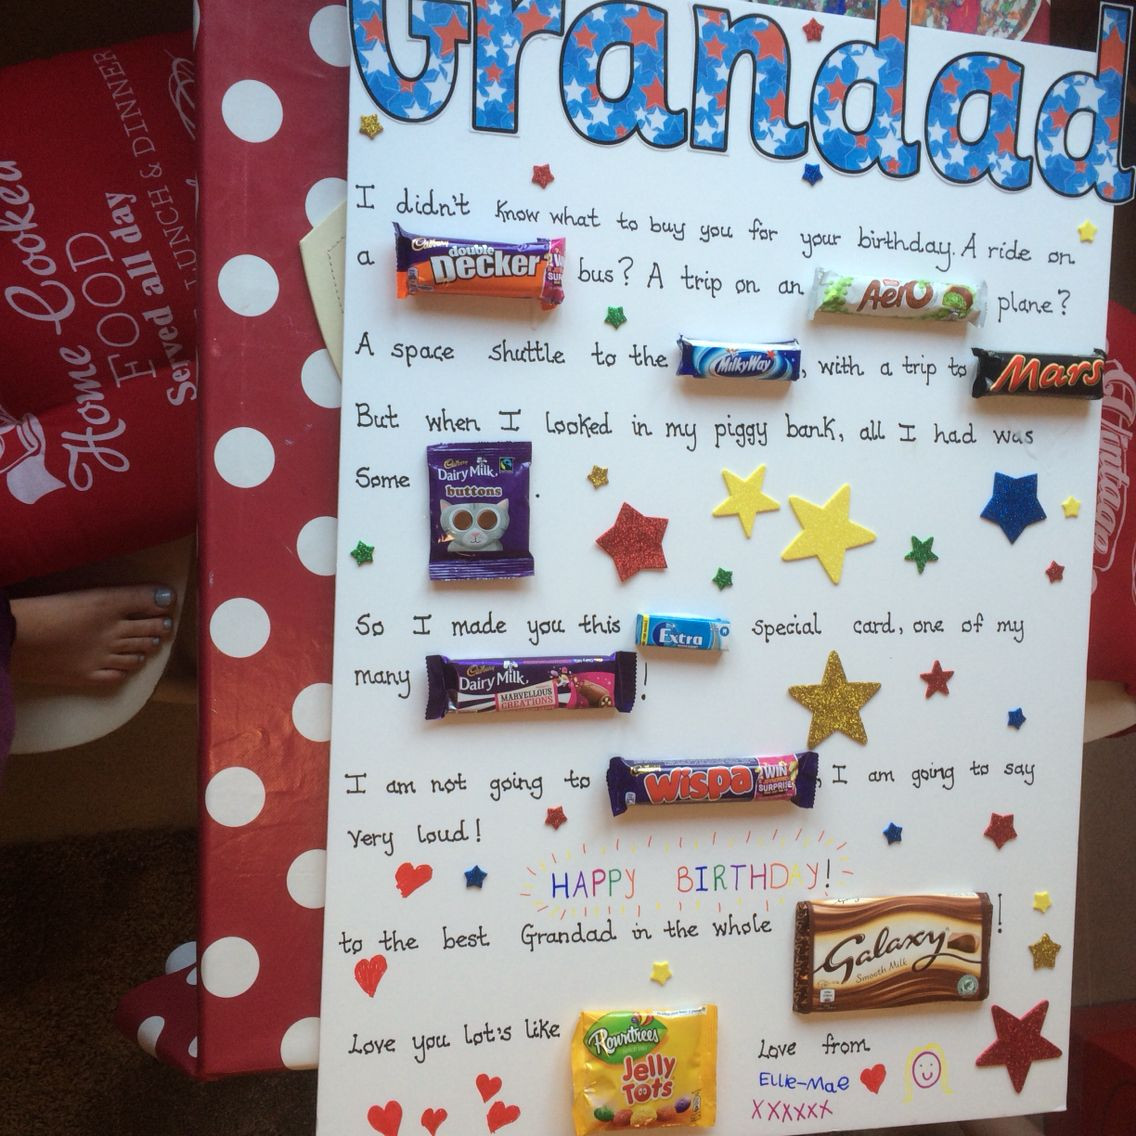 Grandad diy chocolate birthday card Cards Pinterest